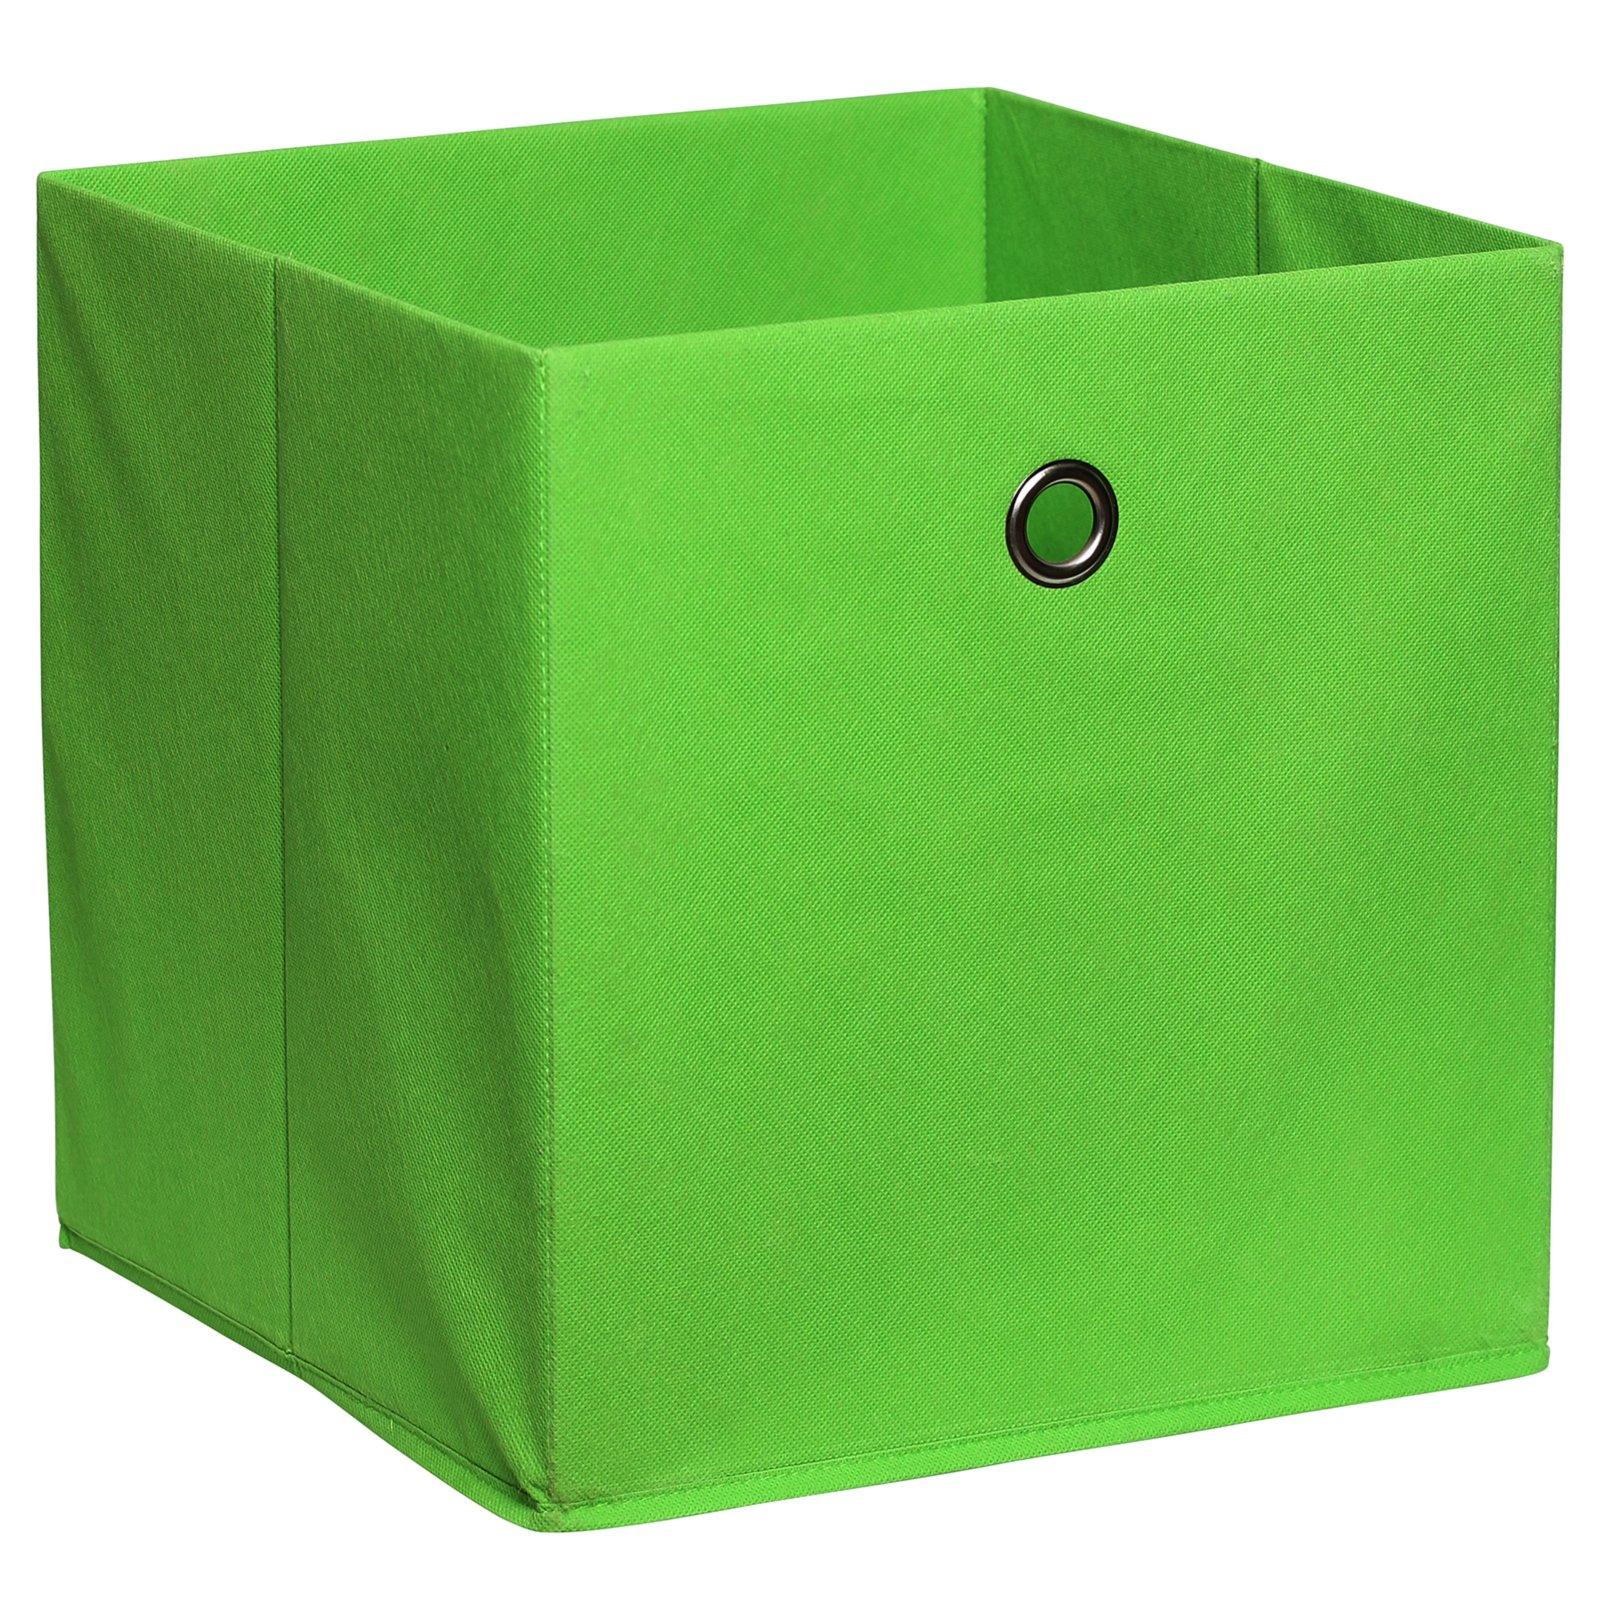 Faltbox - lemon - mit Metallöse - 32x32 cm